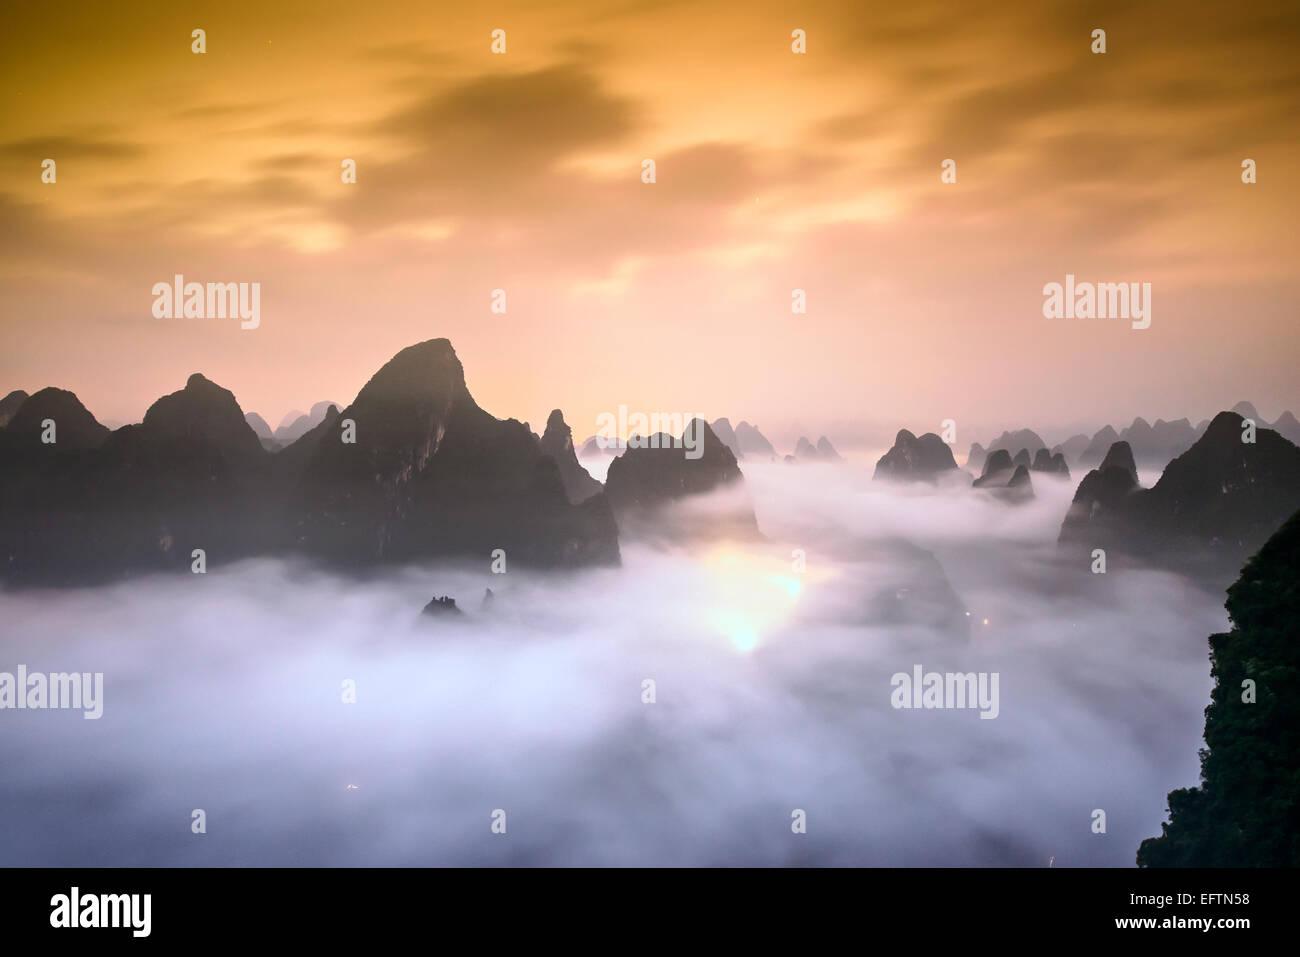 Karst Mountains of Xingping, China. - Stock Image